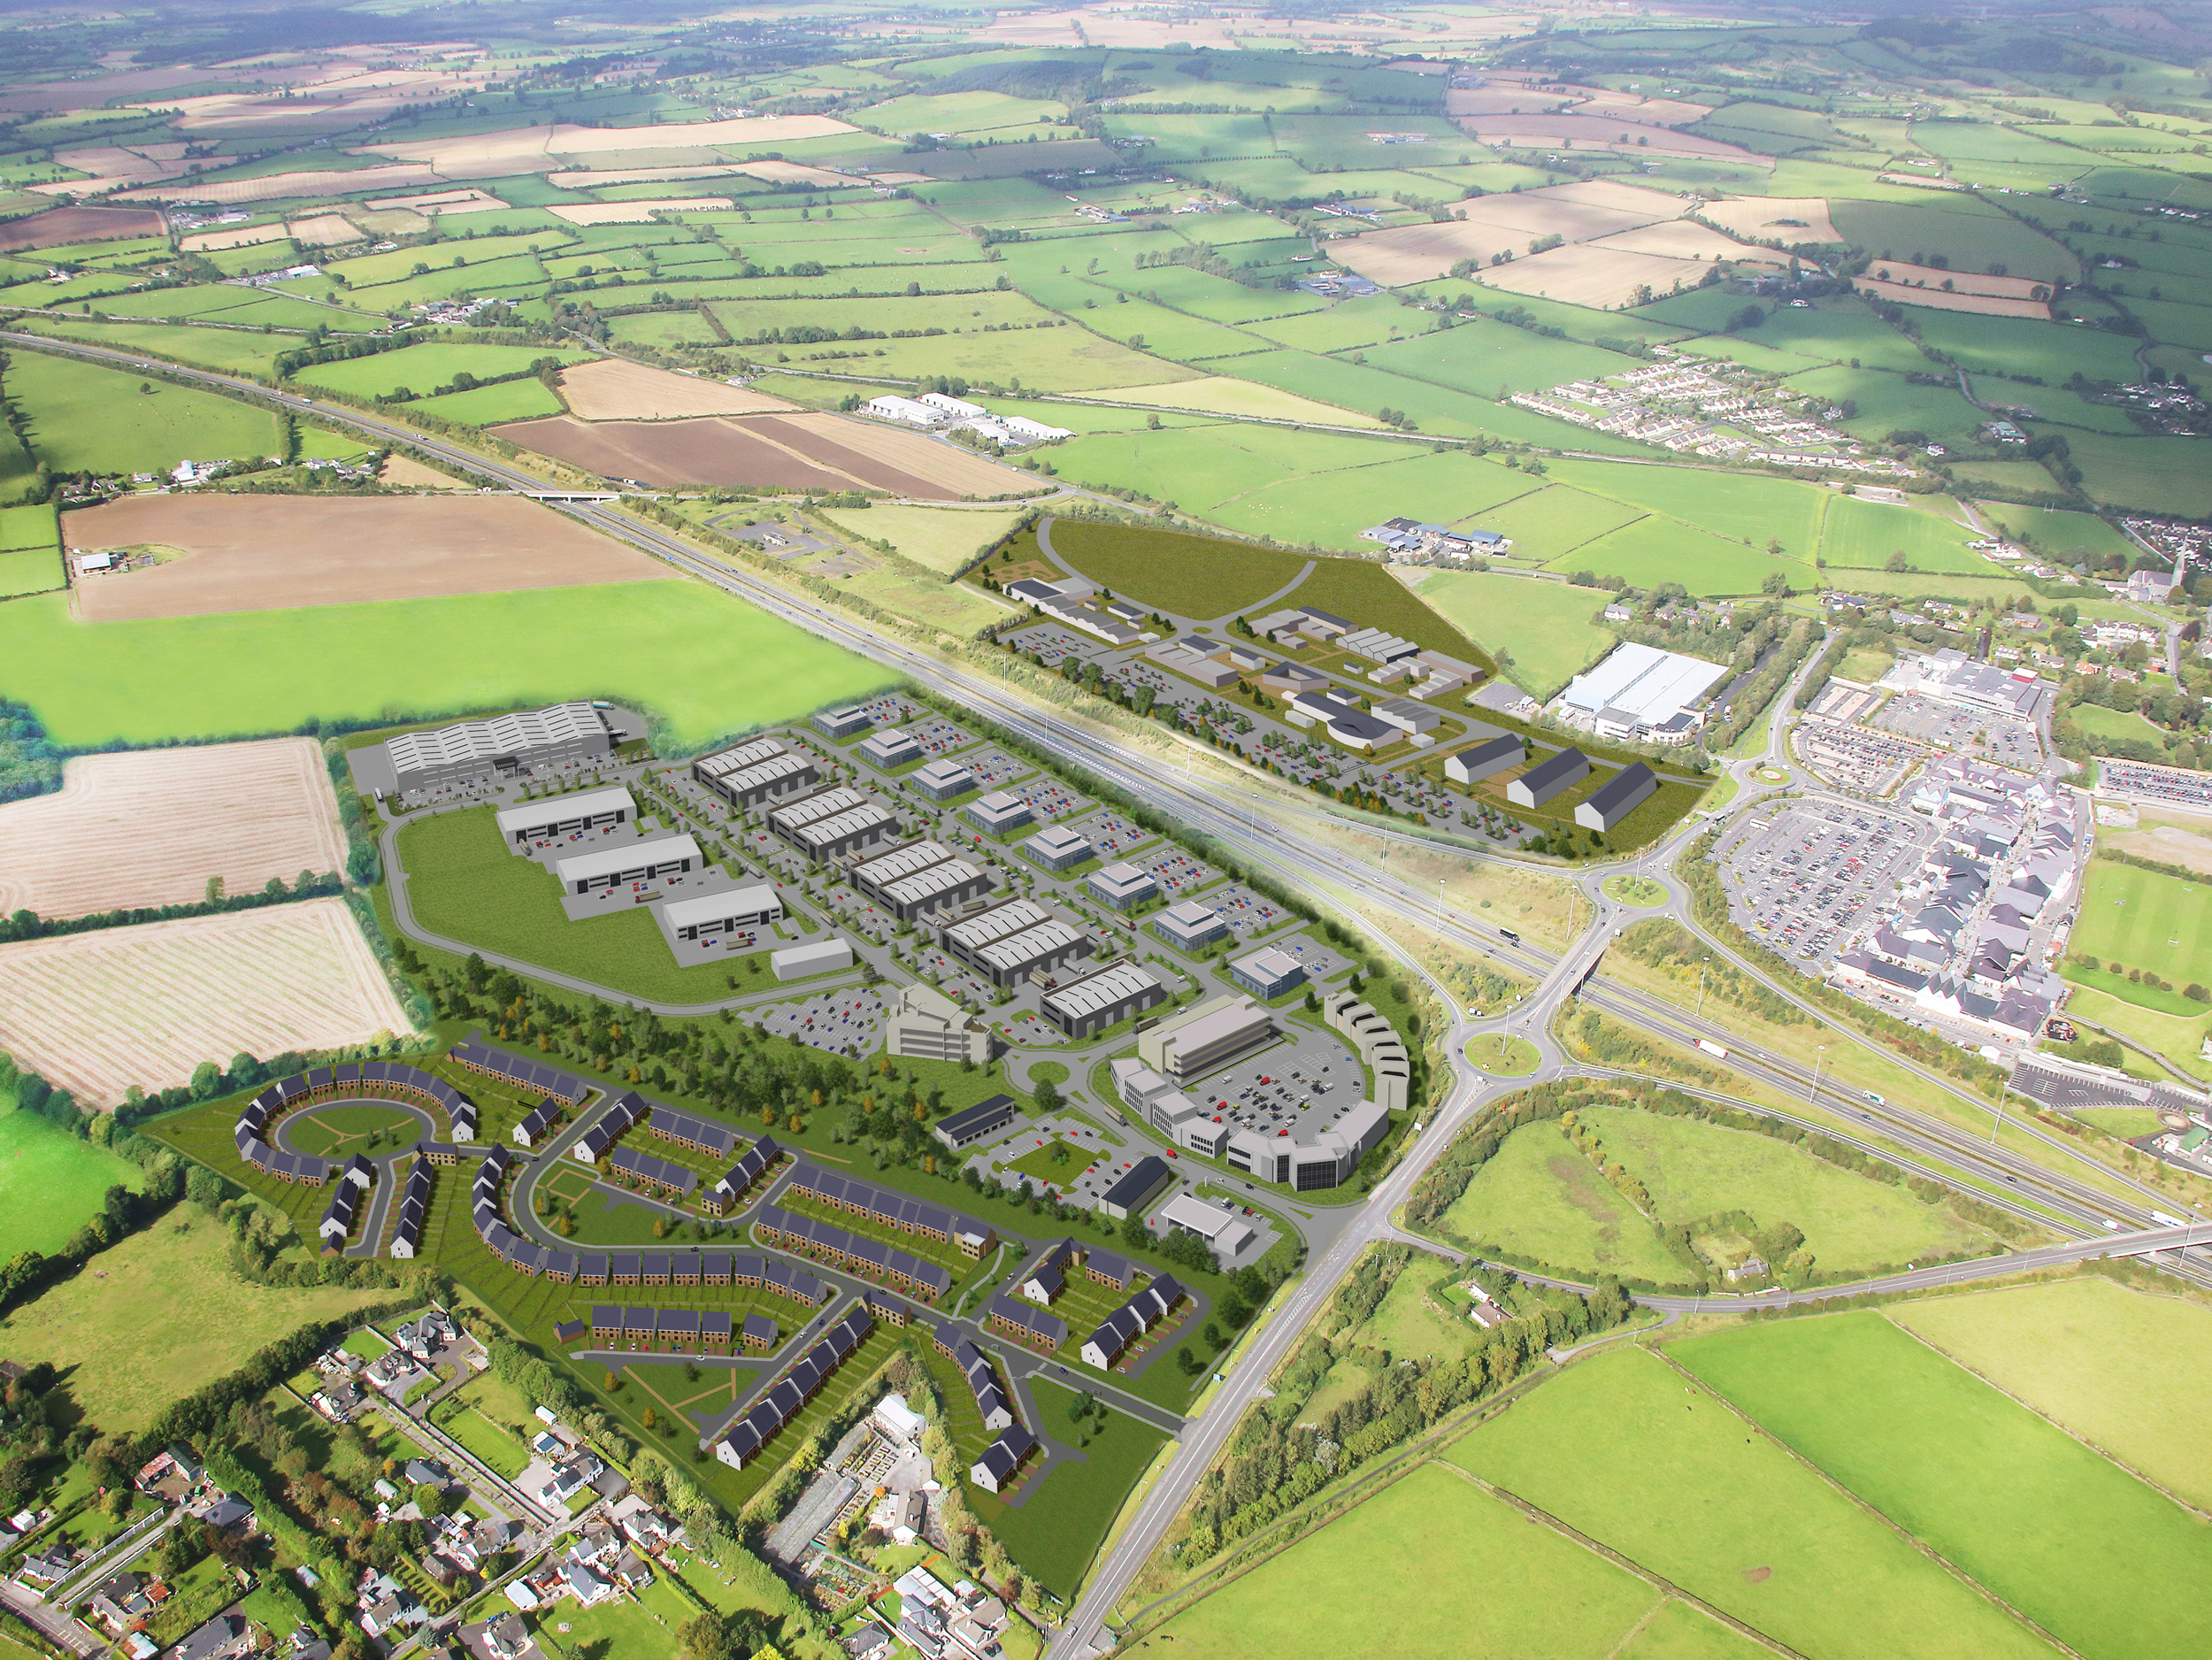 Kildare Crossings - 2015 to PresentAn ambitious mixed-use development in Kildare adjacent to Kildare Village and Kildare Town.